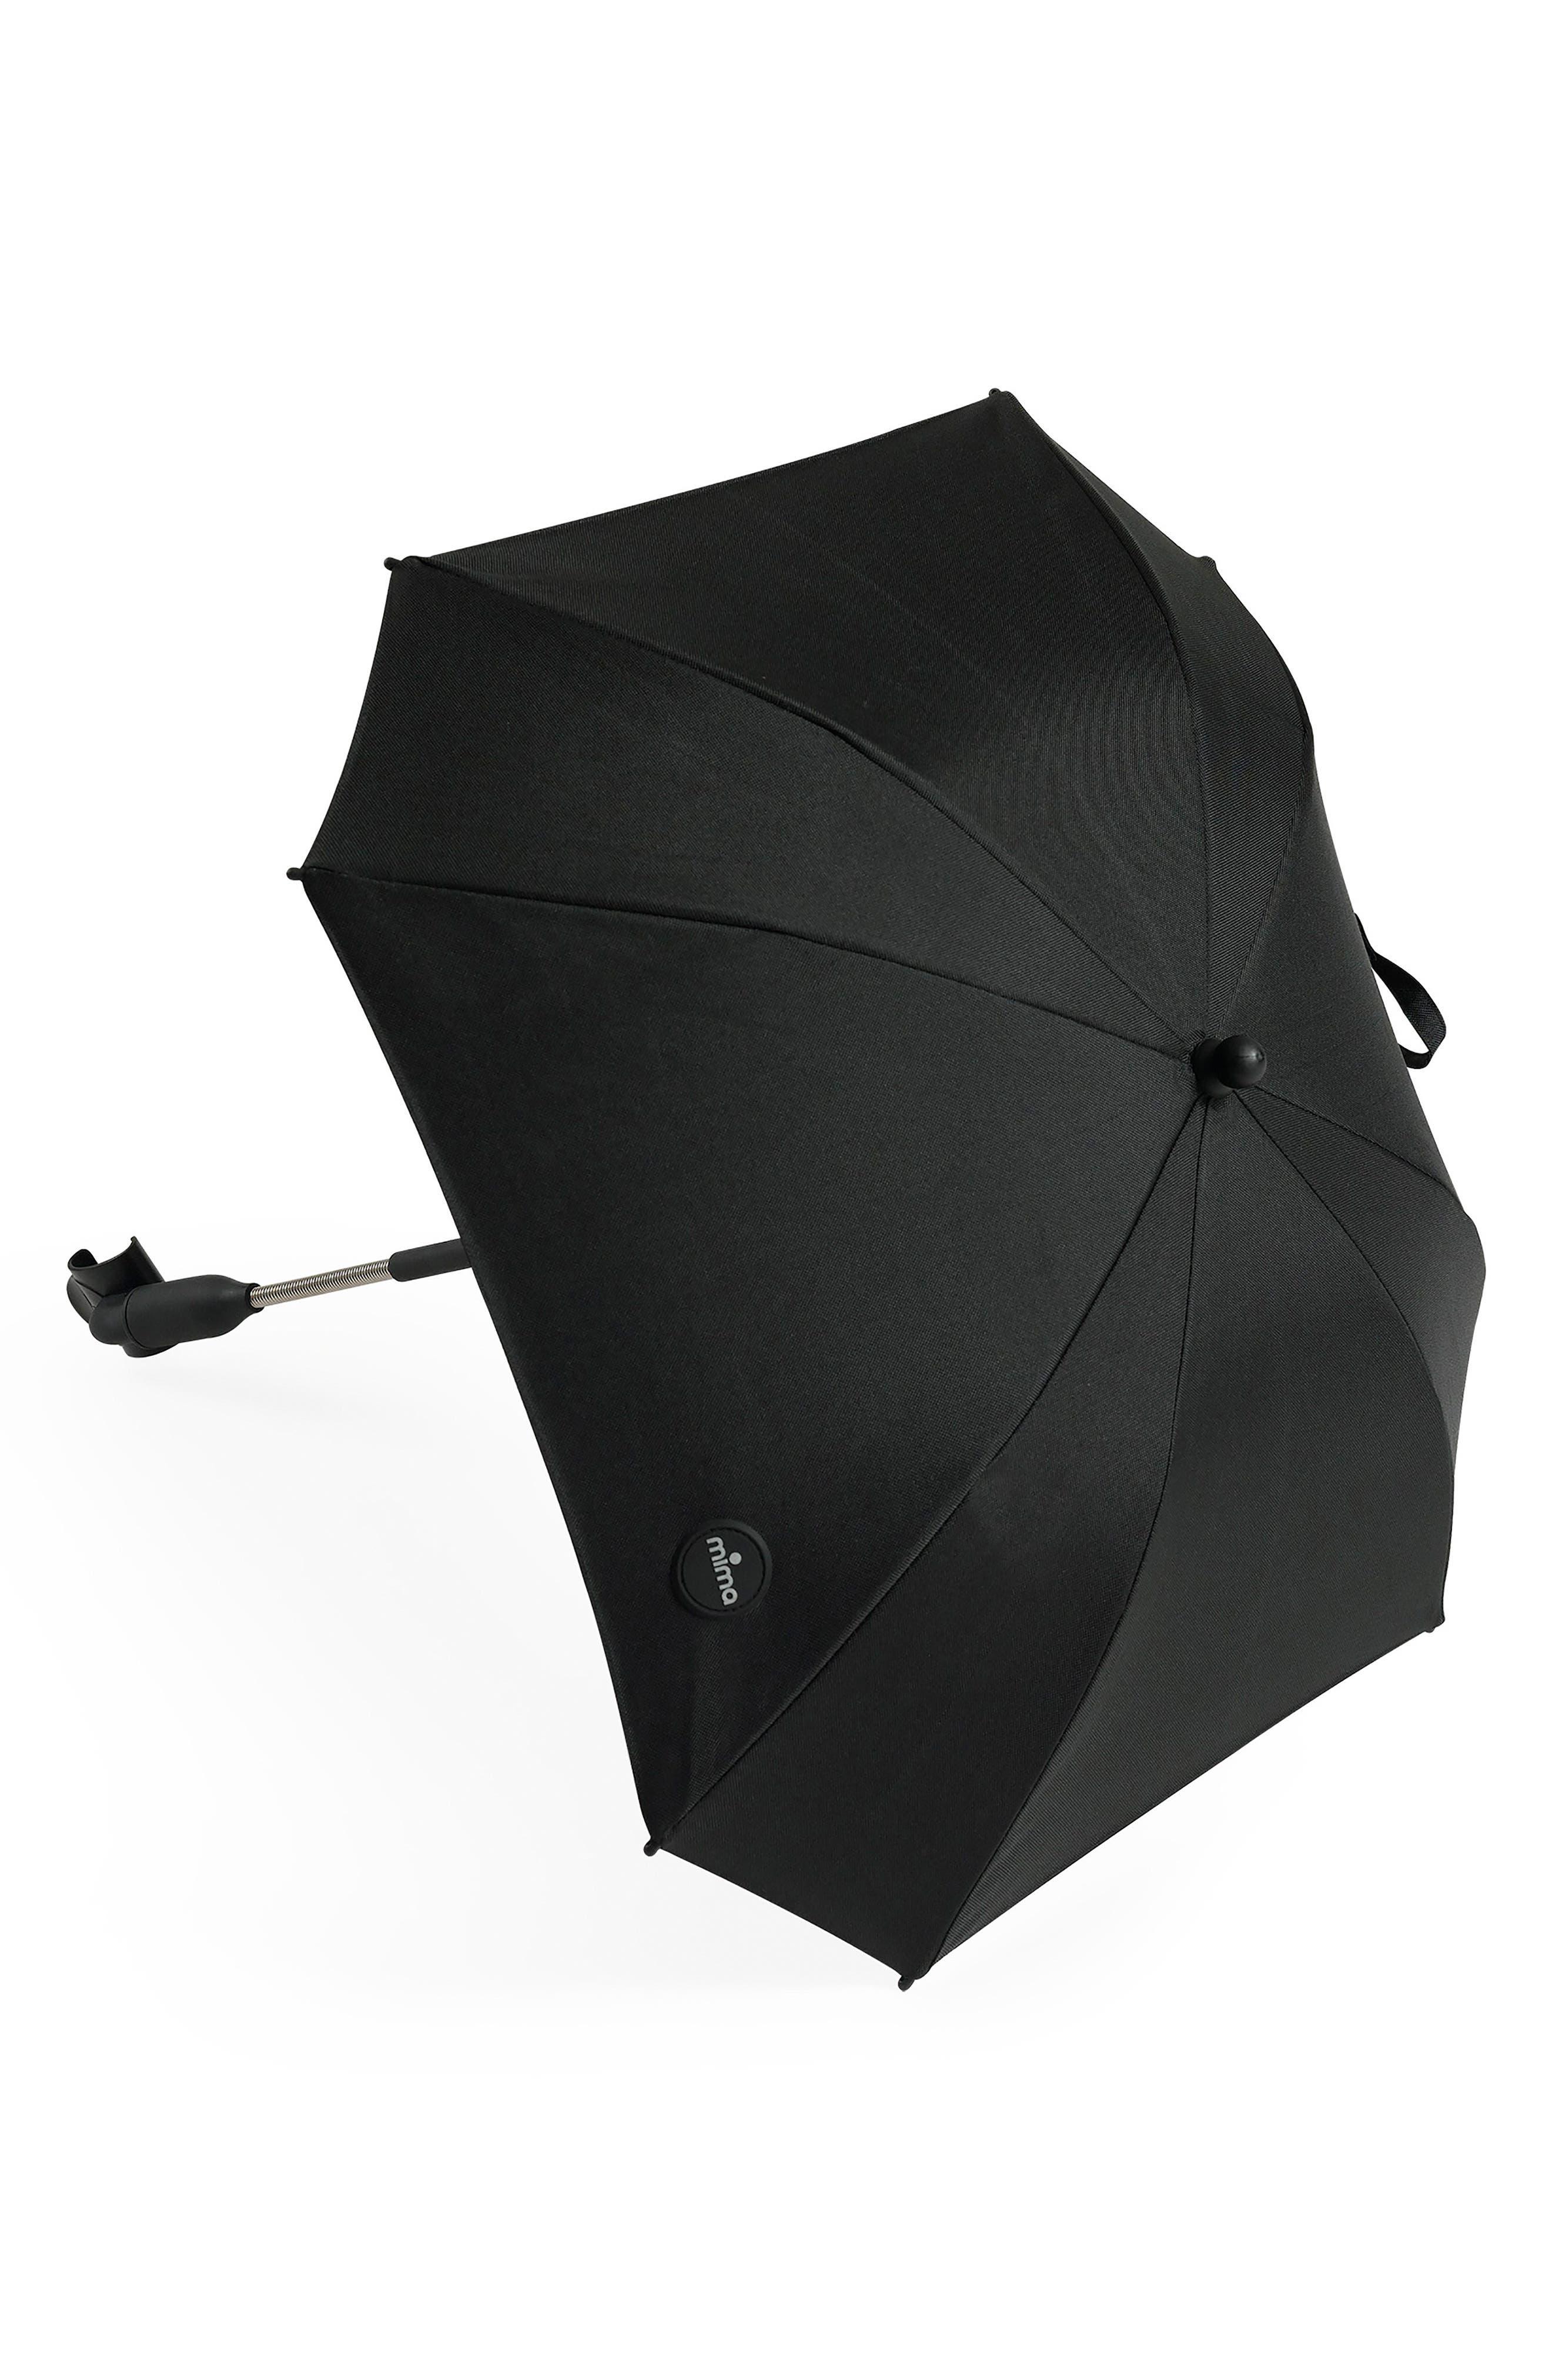 Stroller Umbrella,                         Main,                         color, BLACK